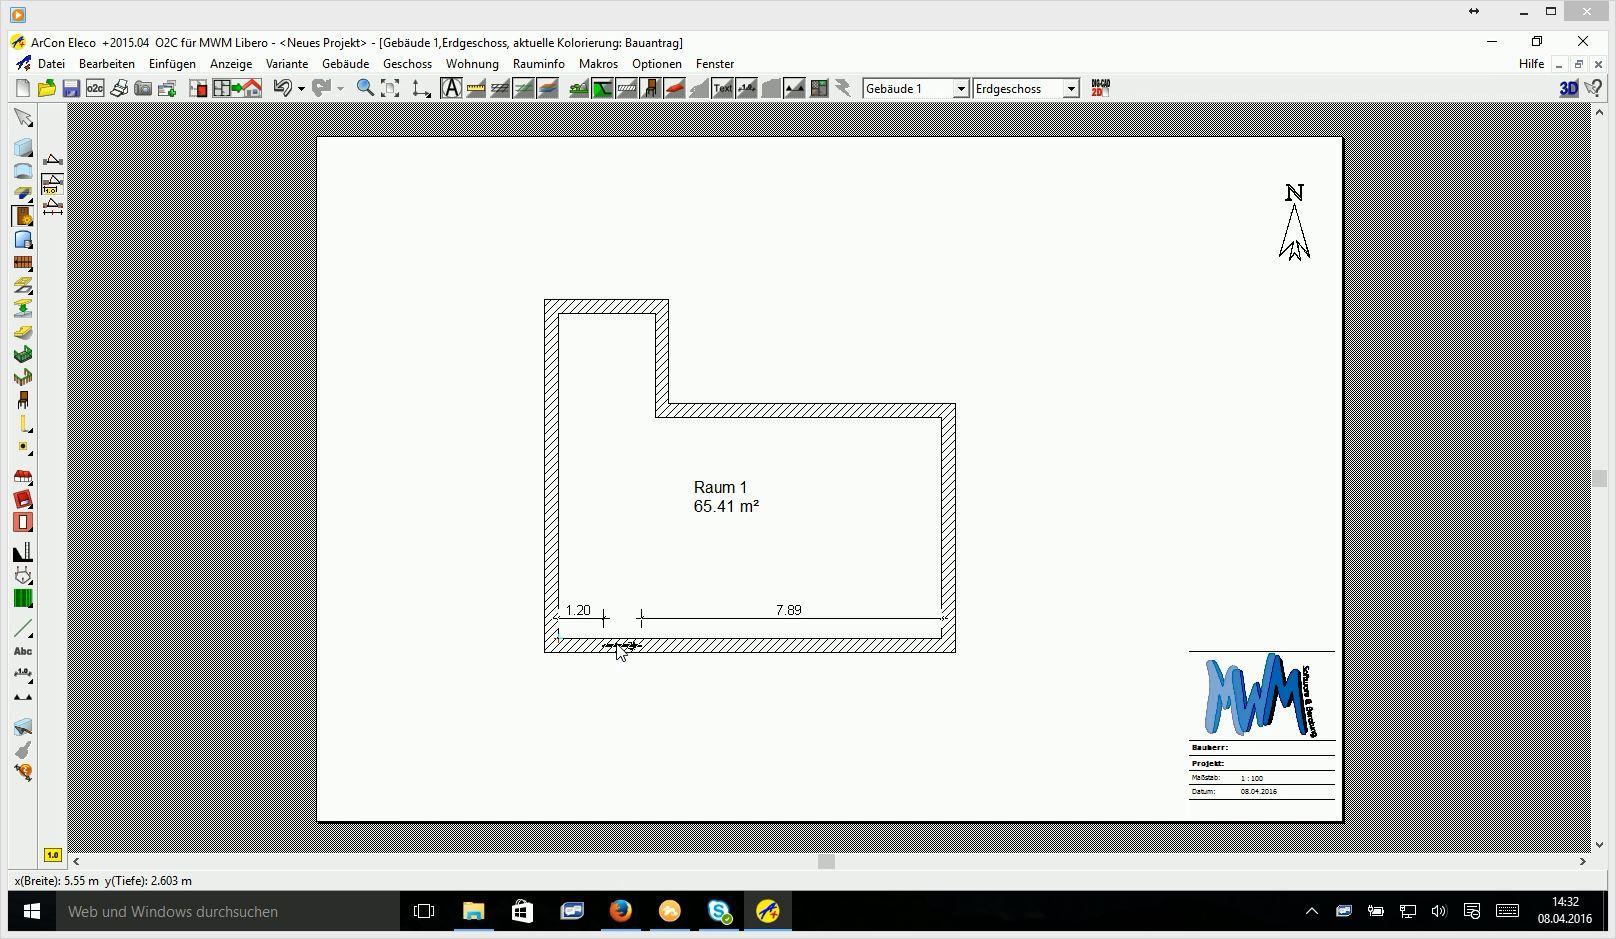 mwm software beratung gmbh software preise arcon f r mwm libero. Black Bedroom Furniture Sets. Home Design Ideas